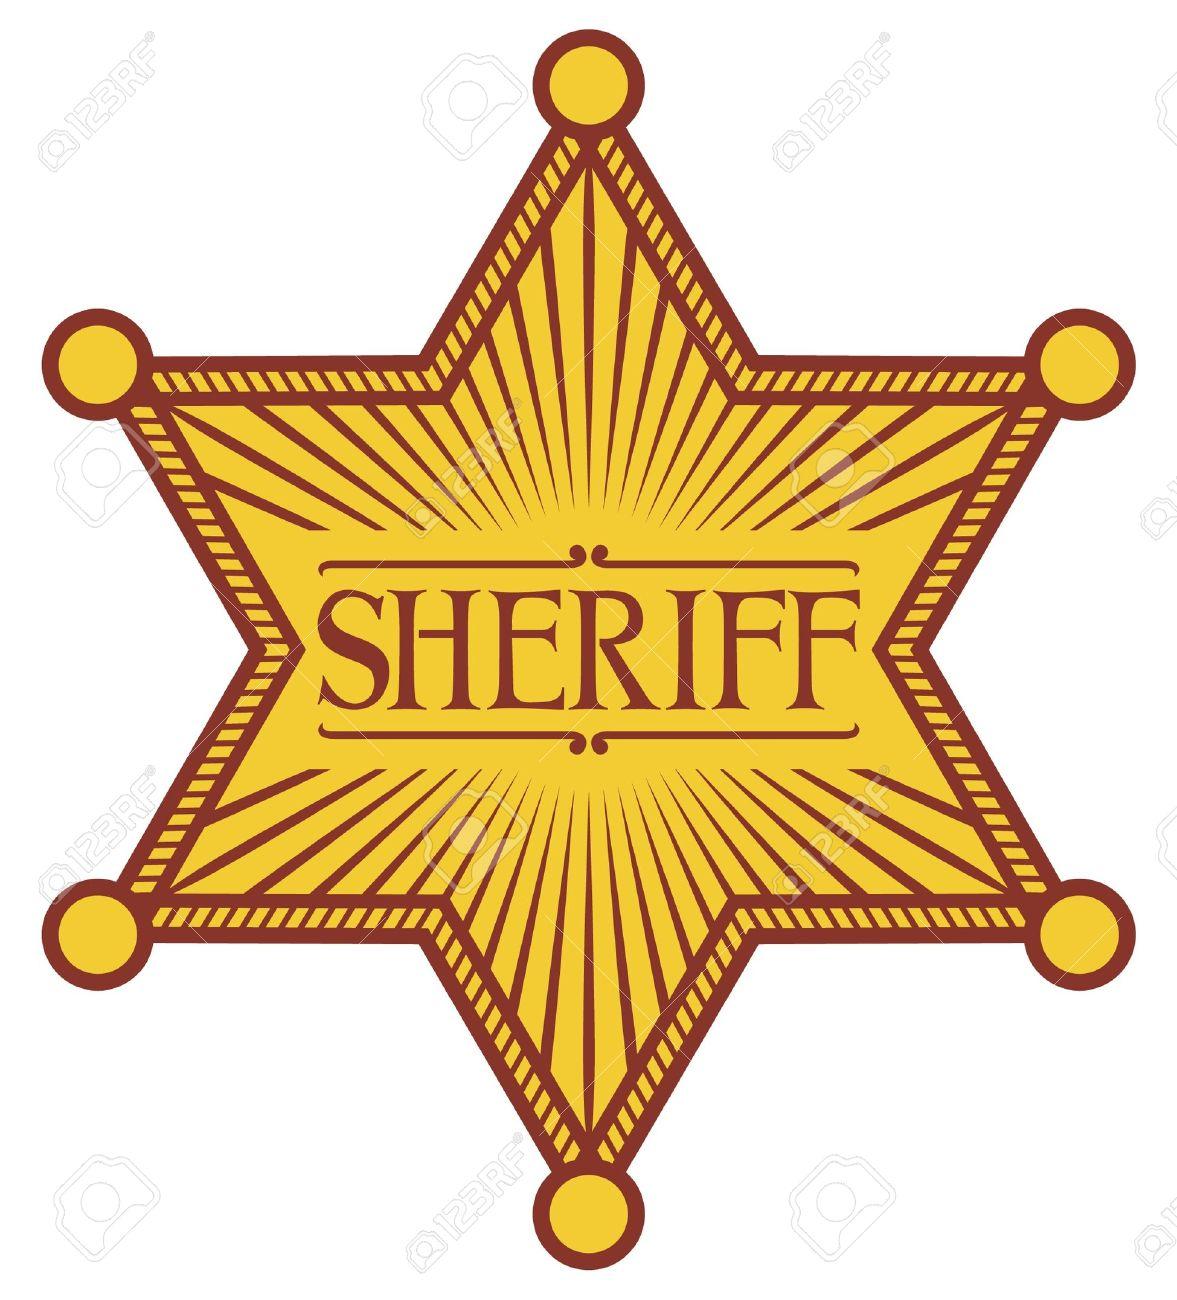 sheriff s star sheriff badge sheriff shield royalty free cliparts rh 123rf com florida sheriff badge vector sheriff badge vector free